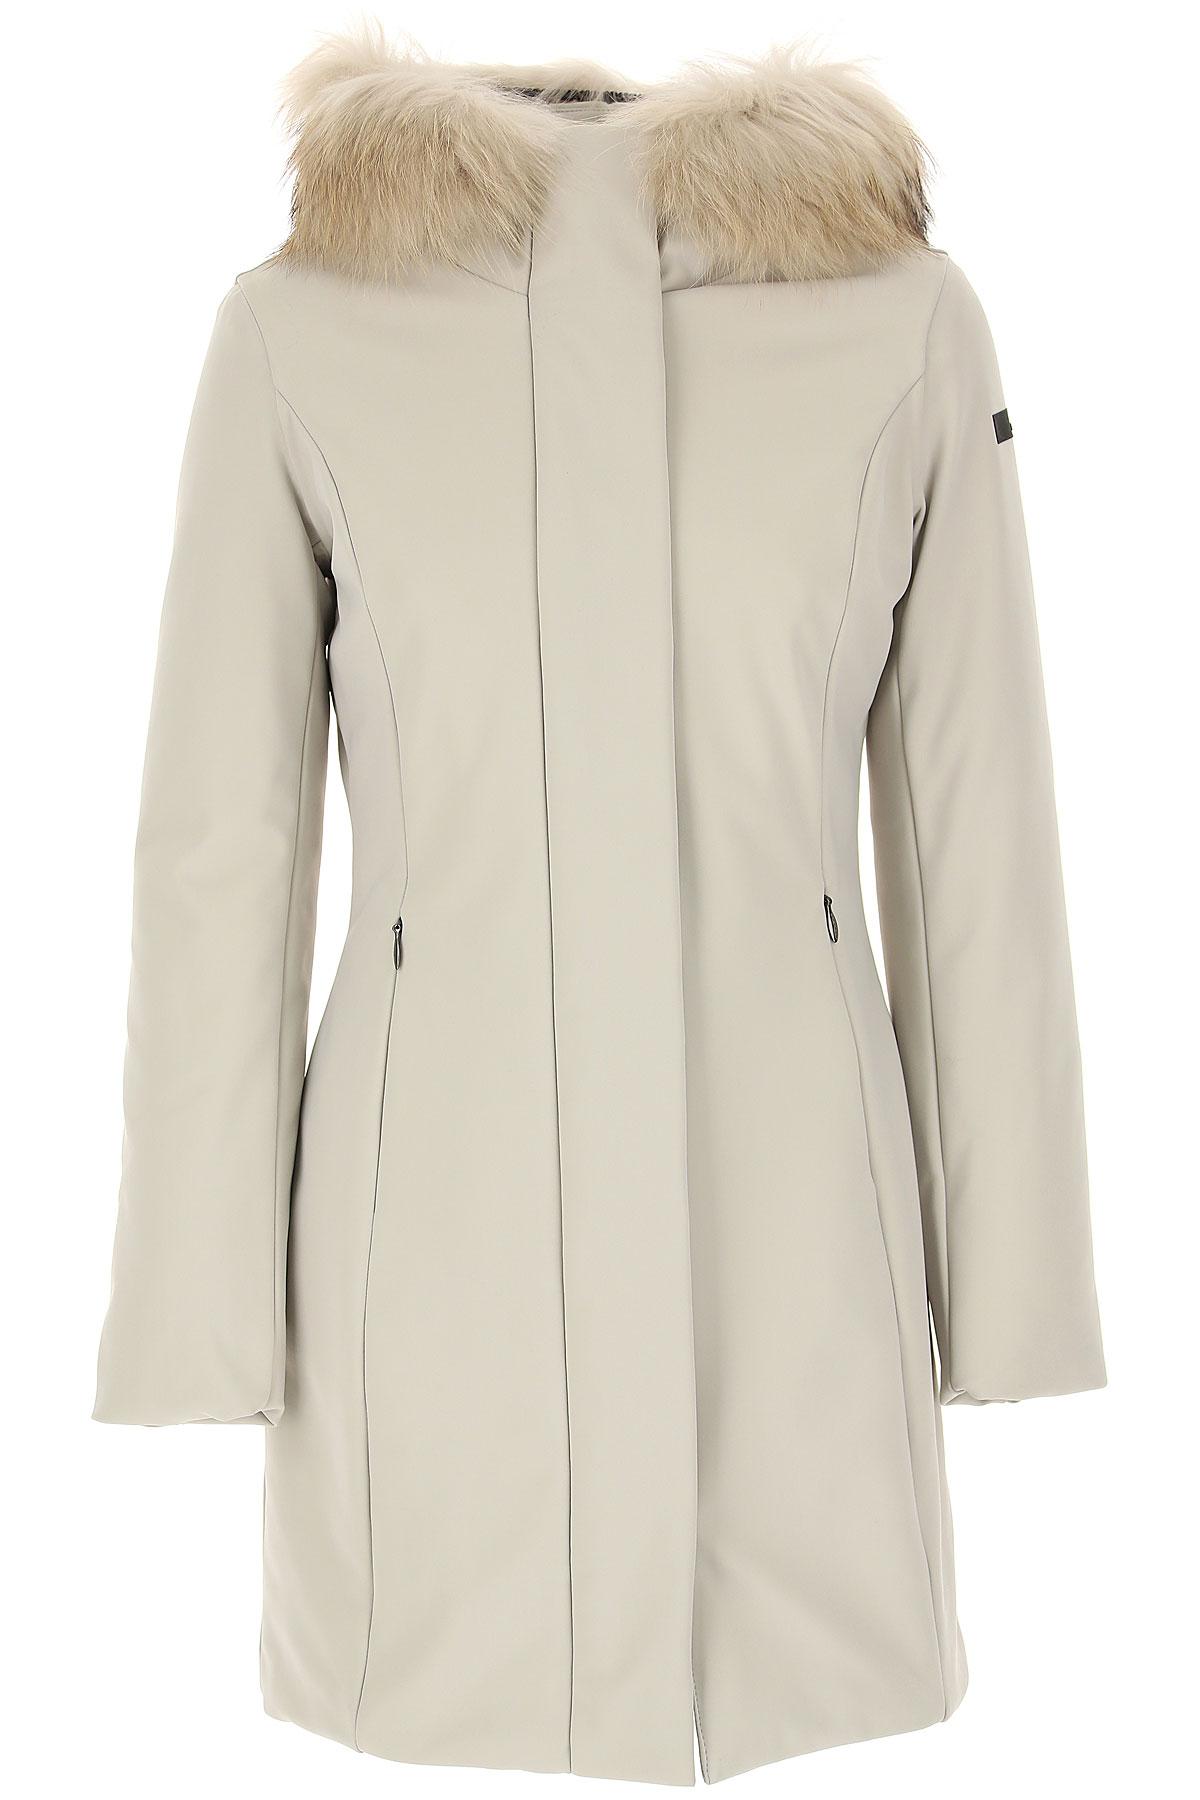 RRD Jacket for Women On Sale, Grey Ice, polyamide, 2019, 10 12 4 6 8